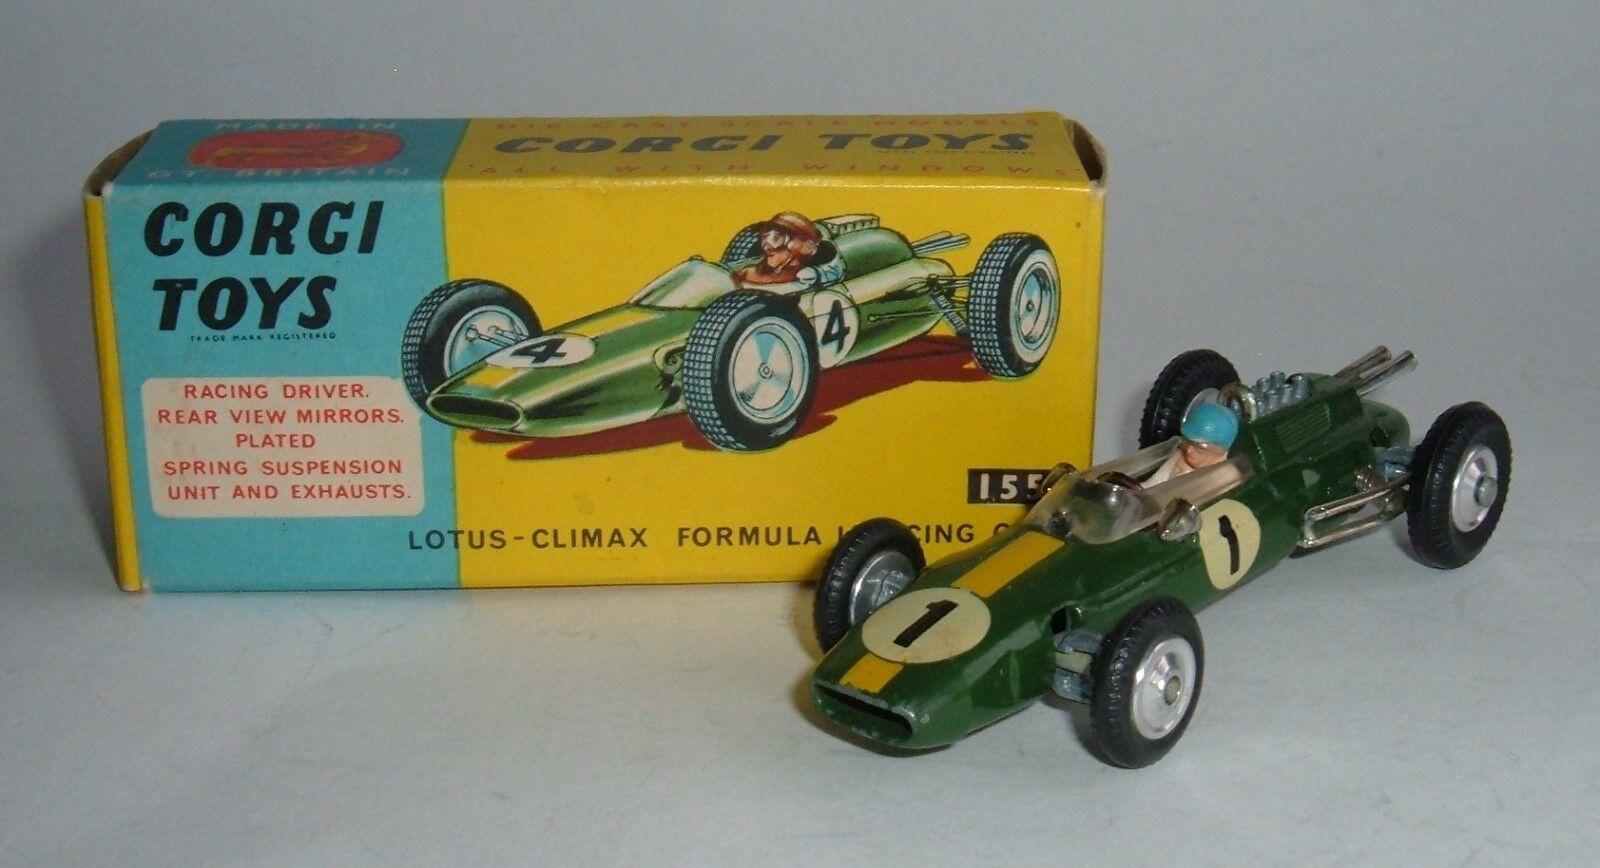 CORGI TOYS Nº 155, LOTUS-CLIMAX F1 Auto da Corsa, - SUPERBA